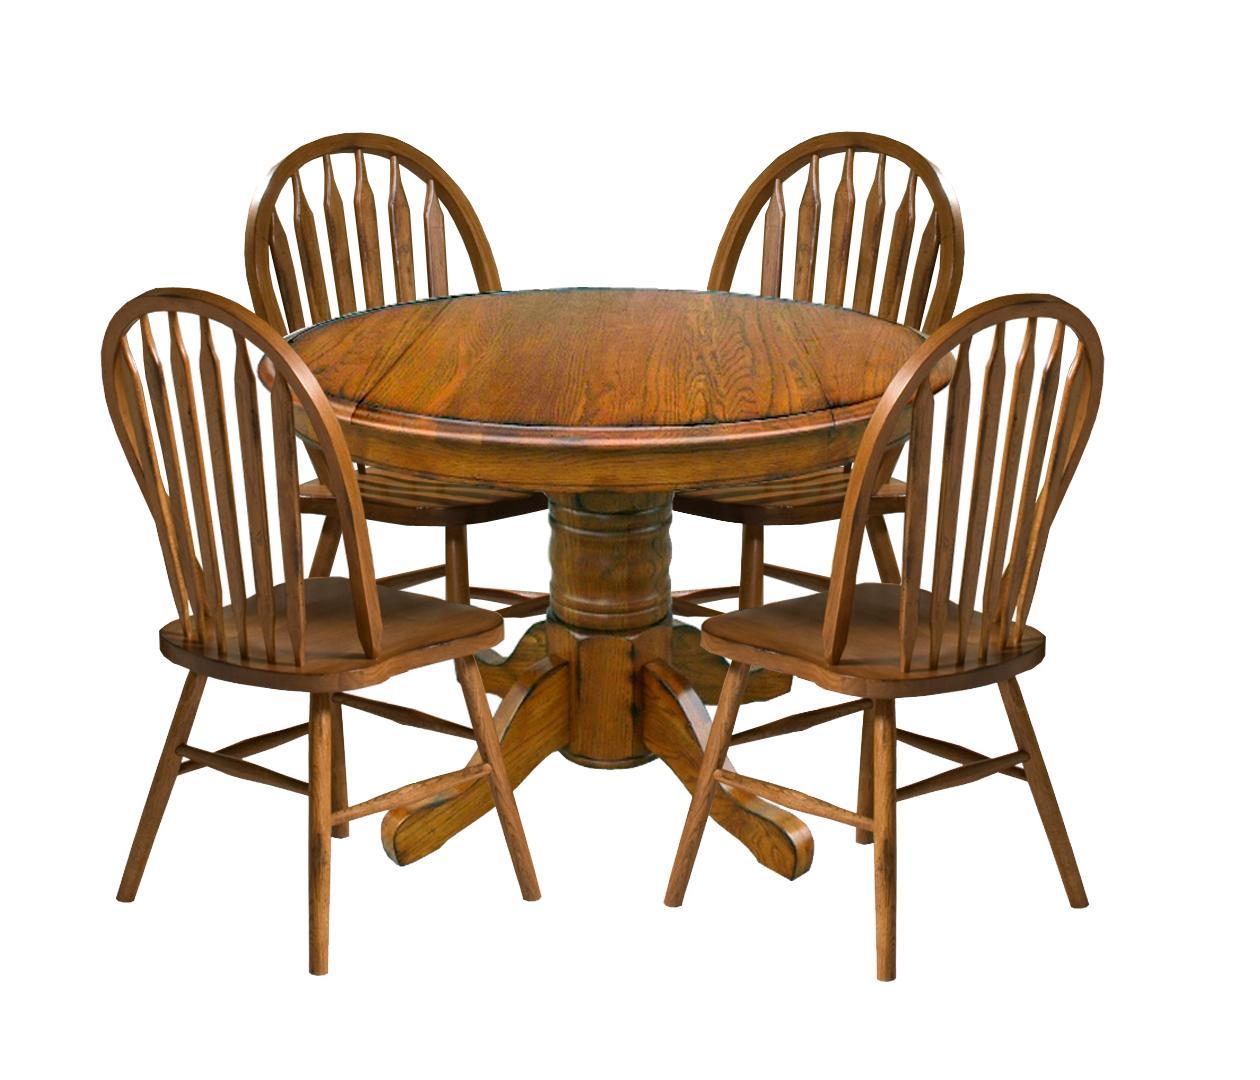 Intercon Classic Oak Five Piece Dining Set - Item Number: CO-TA-42D-BRU-BSE+TOP+4x253SH